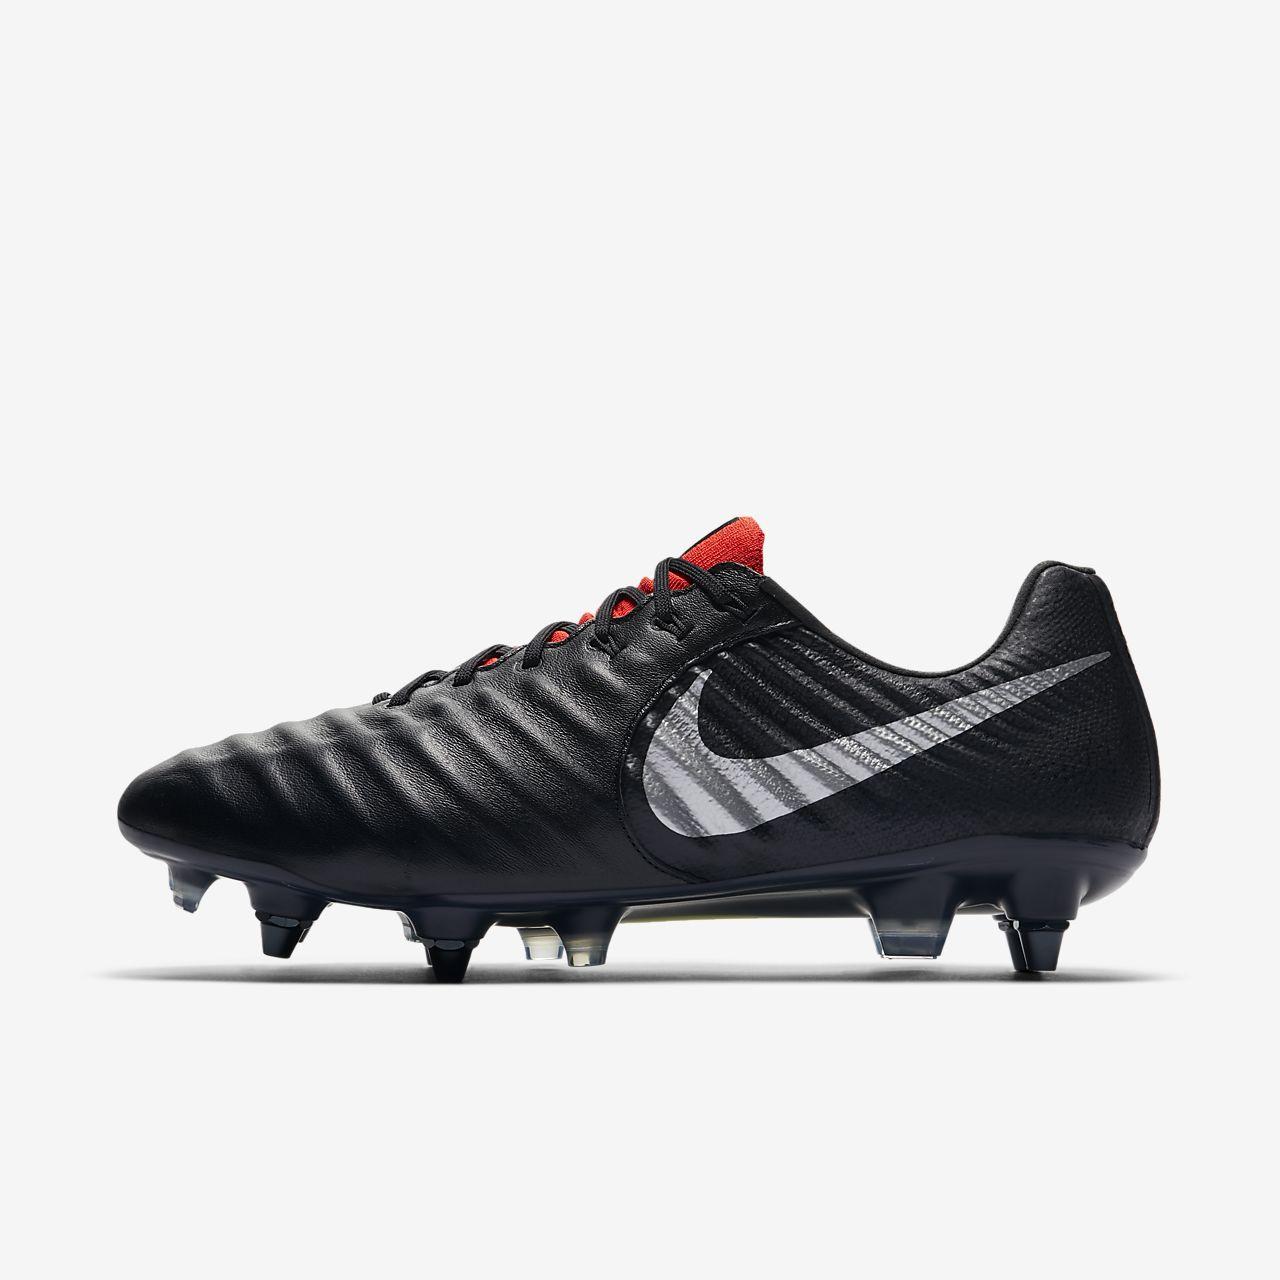 cb411324b039 ... release date nike tiempo legend vii elite sg pro anti clog soft ground football  boot 2d131